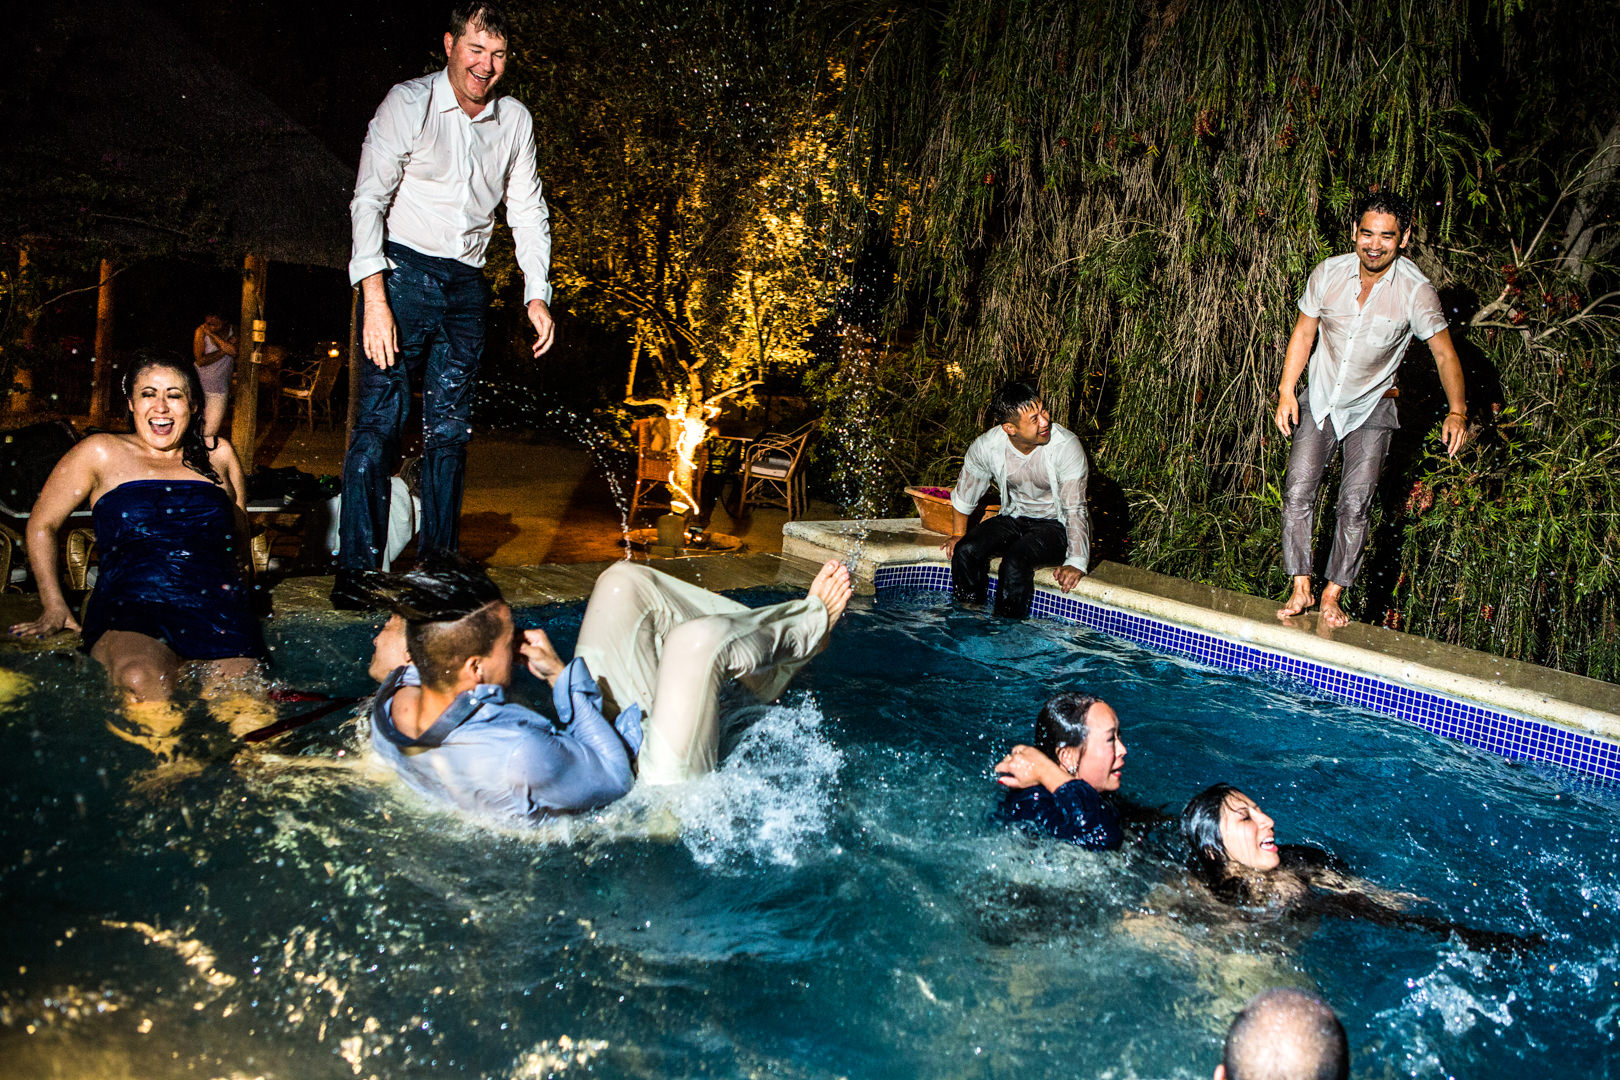 Boda-Hacienda-San-Rafael-Sevilla-engagement-Rafael-Torres-fotografo-bodas-sevilla-madrid-barcelona-wedding-photographer--114.jpg